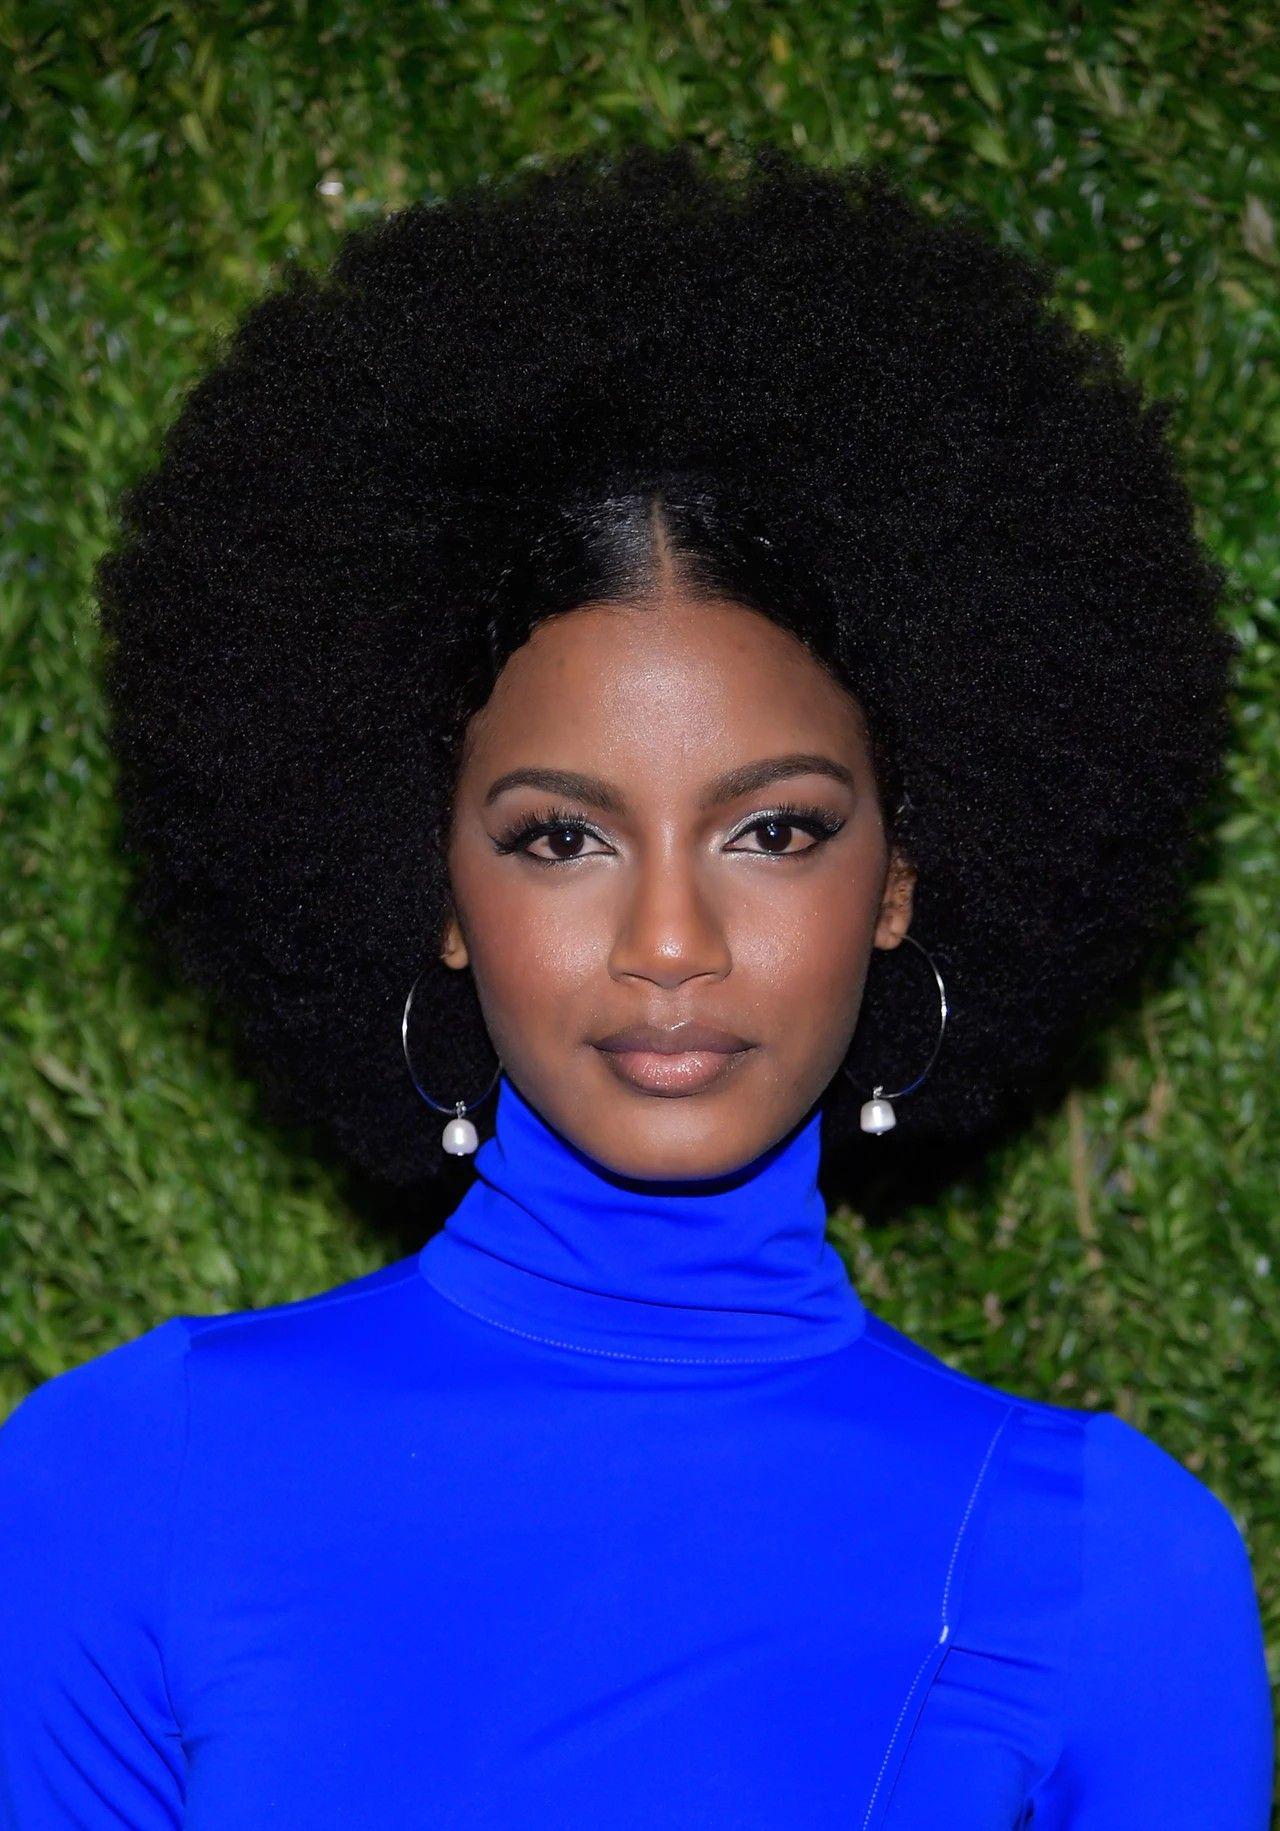 Pin By Jasmine Simone On Black Hair Natural Hair Styles Hair Styles Super Short Hair